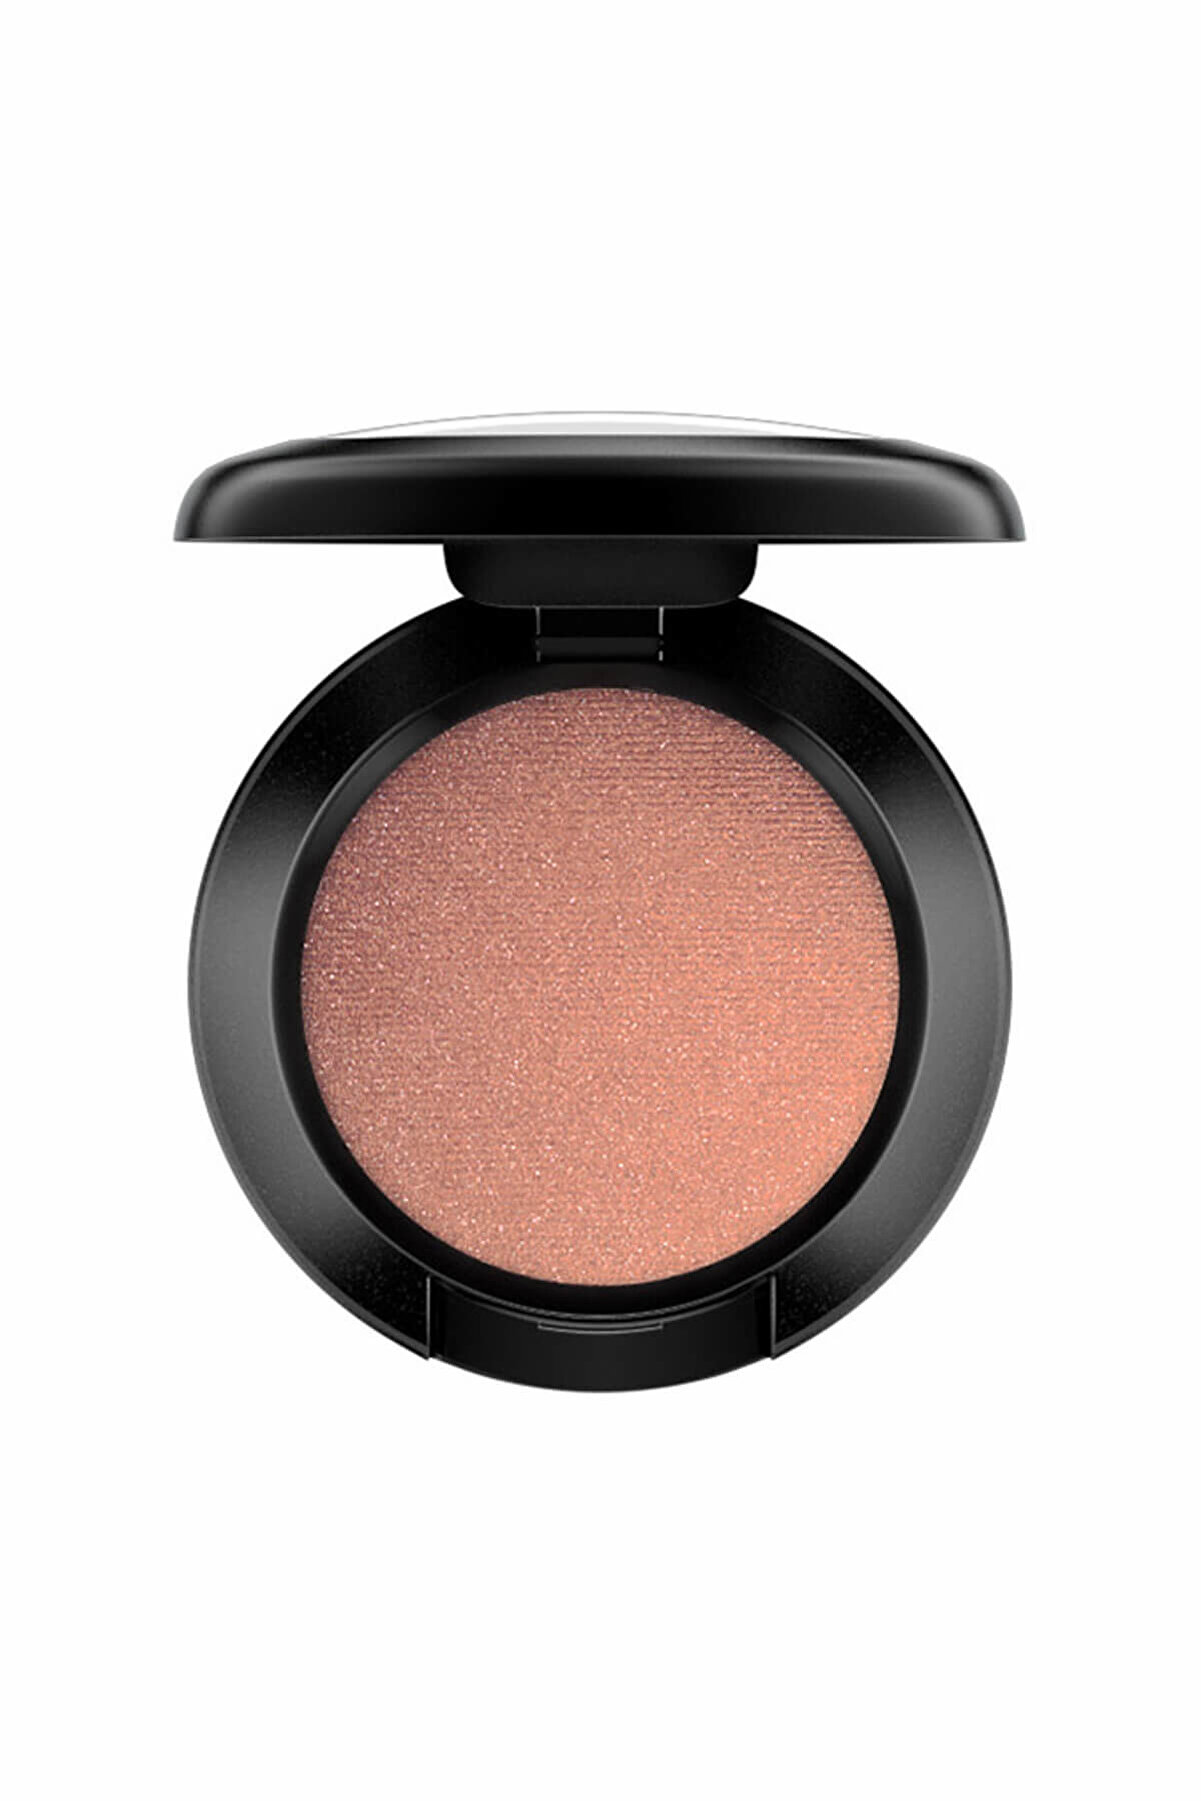 Mac Göz Farı - Eye Shadow Expensive Pink 1.5 g 773602077120